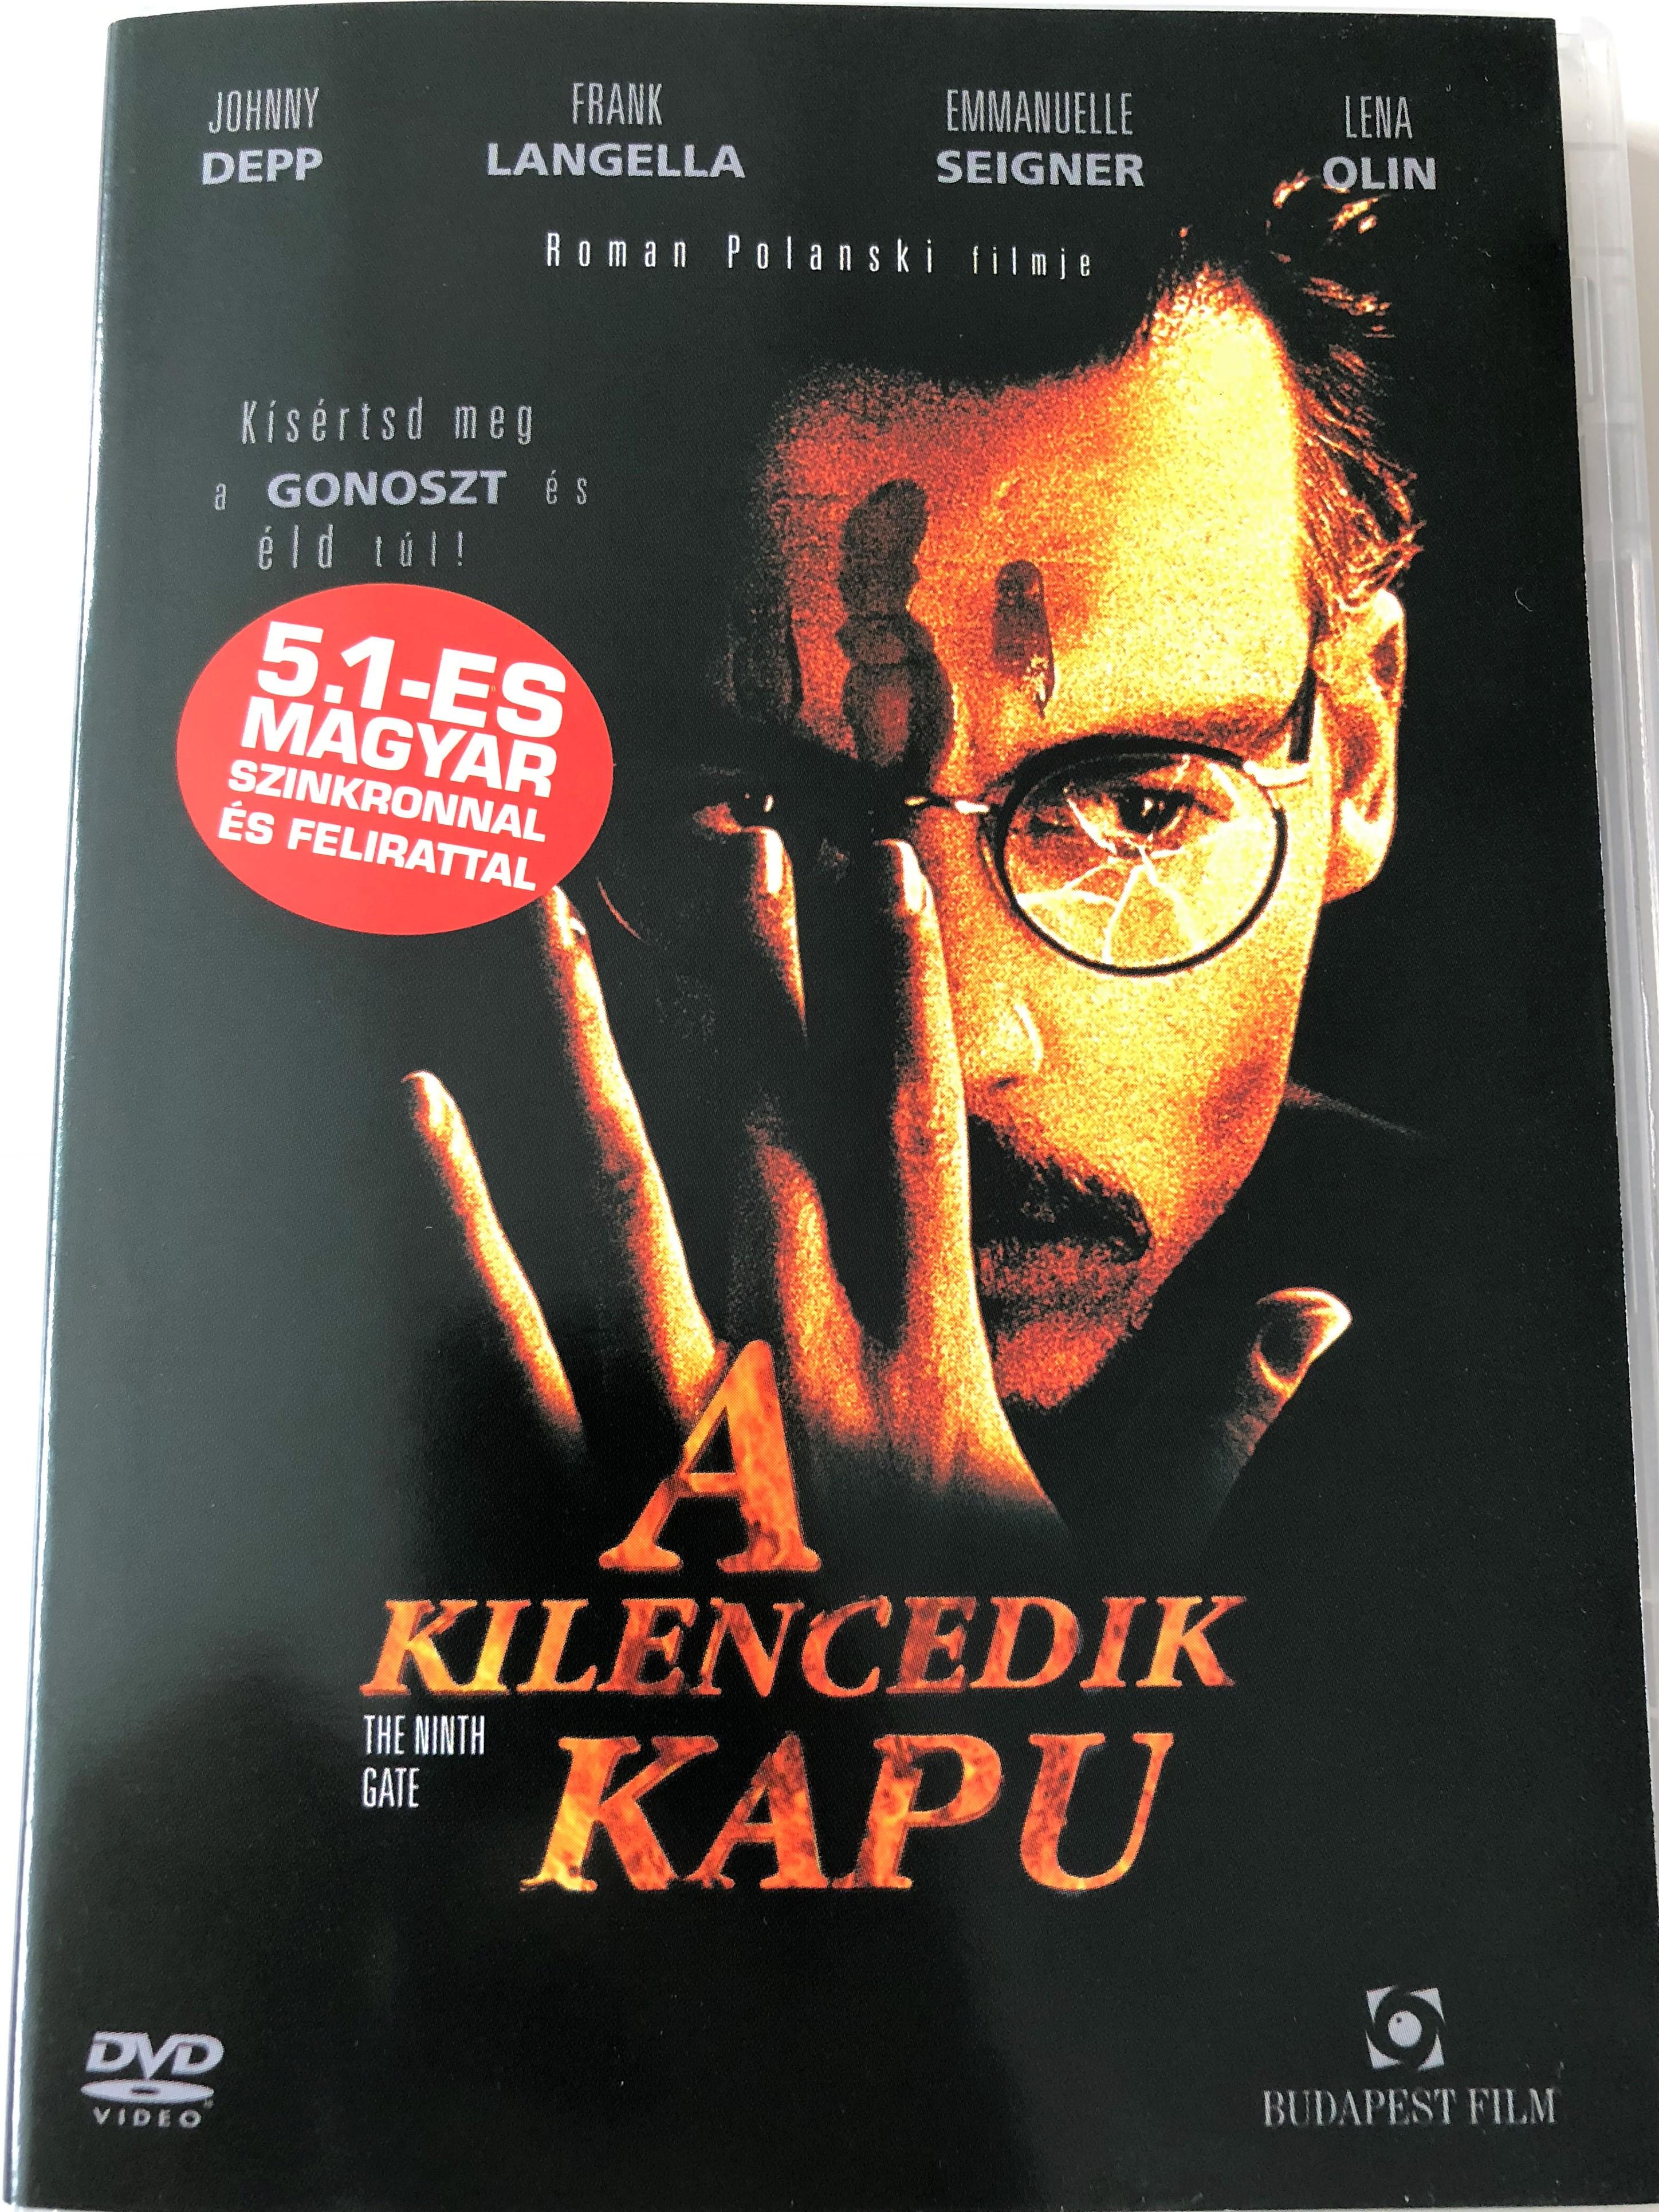 the-ninth-gate-dvd-1999-a-kilencedik-kapu-directed-by-roman-polanski-starring-johnny-depp-lena-olin-frank-langella-james-russo-jack-taylor-emmanuelle-seigner-1-.jpg